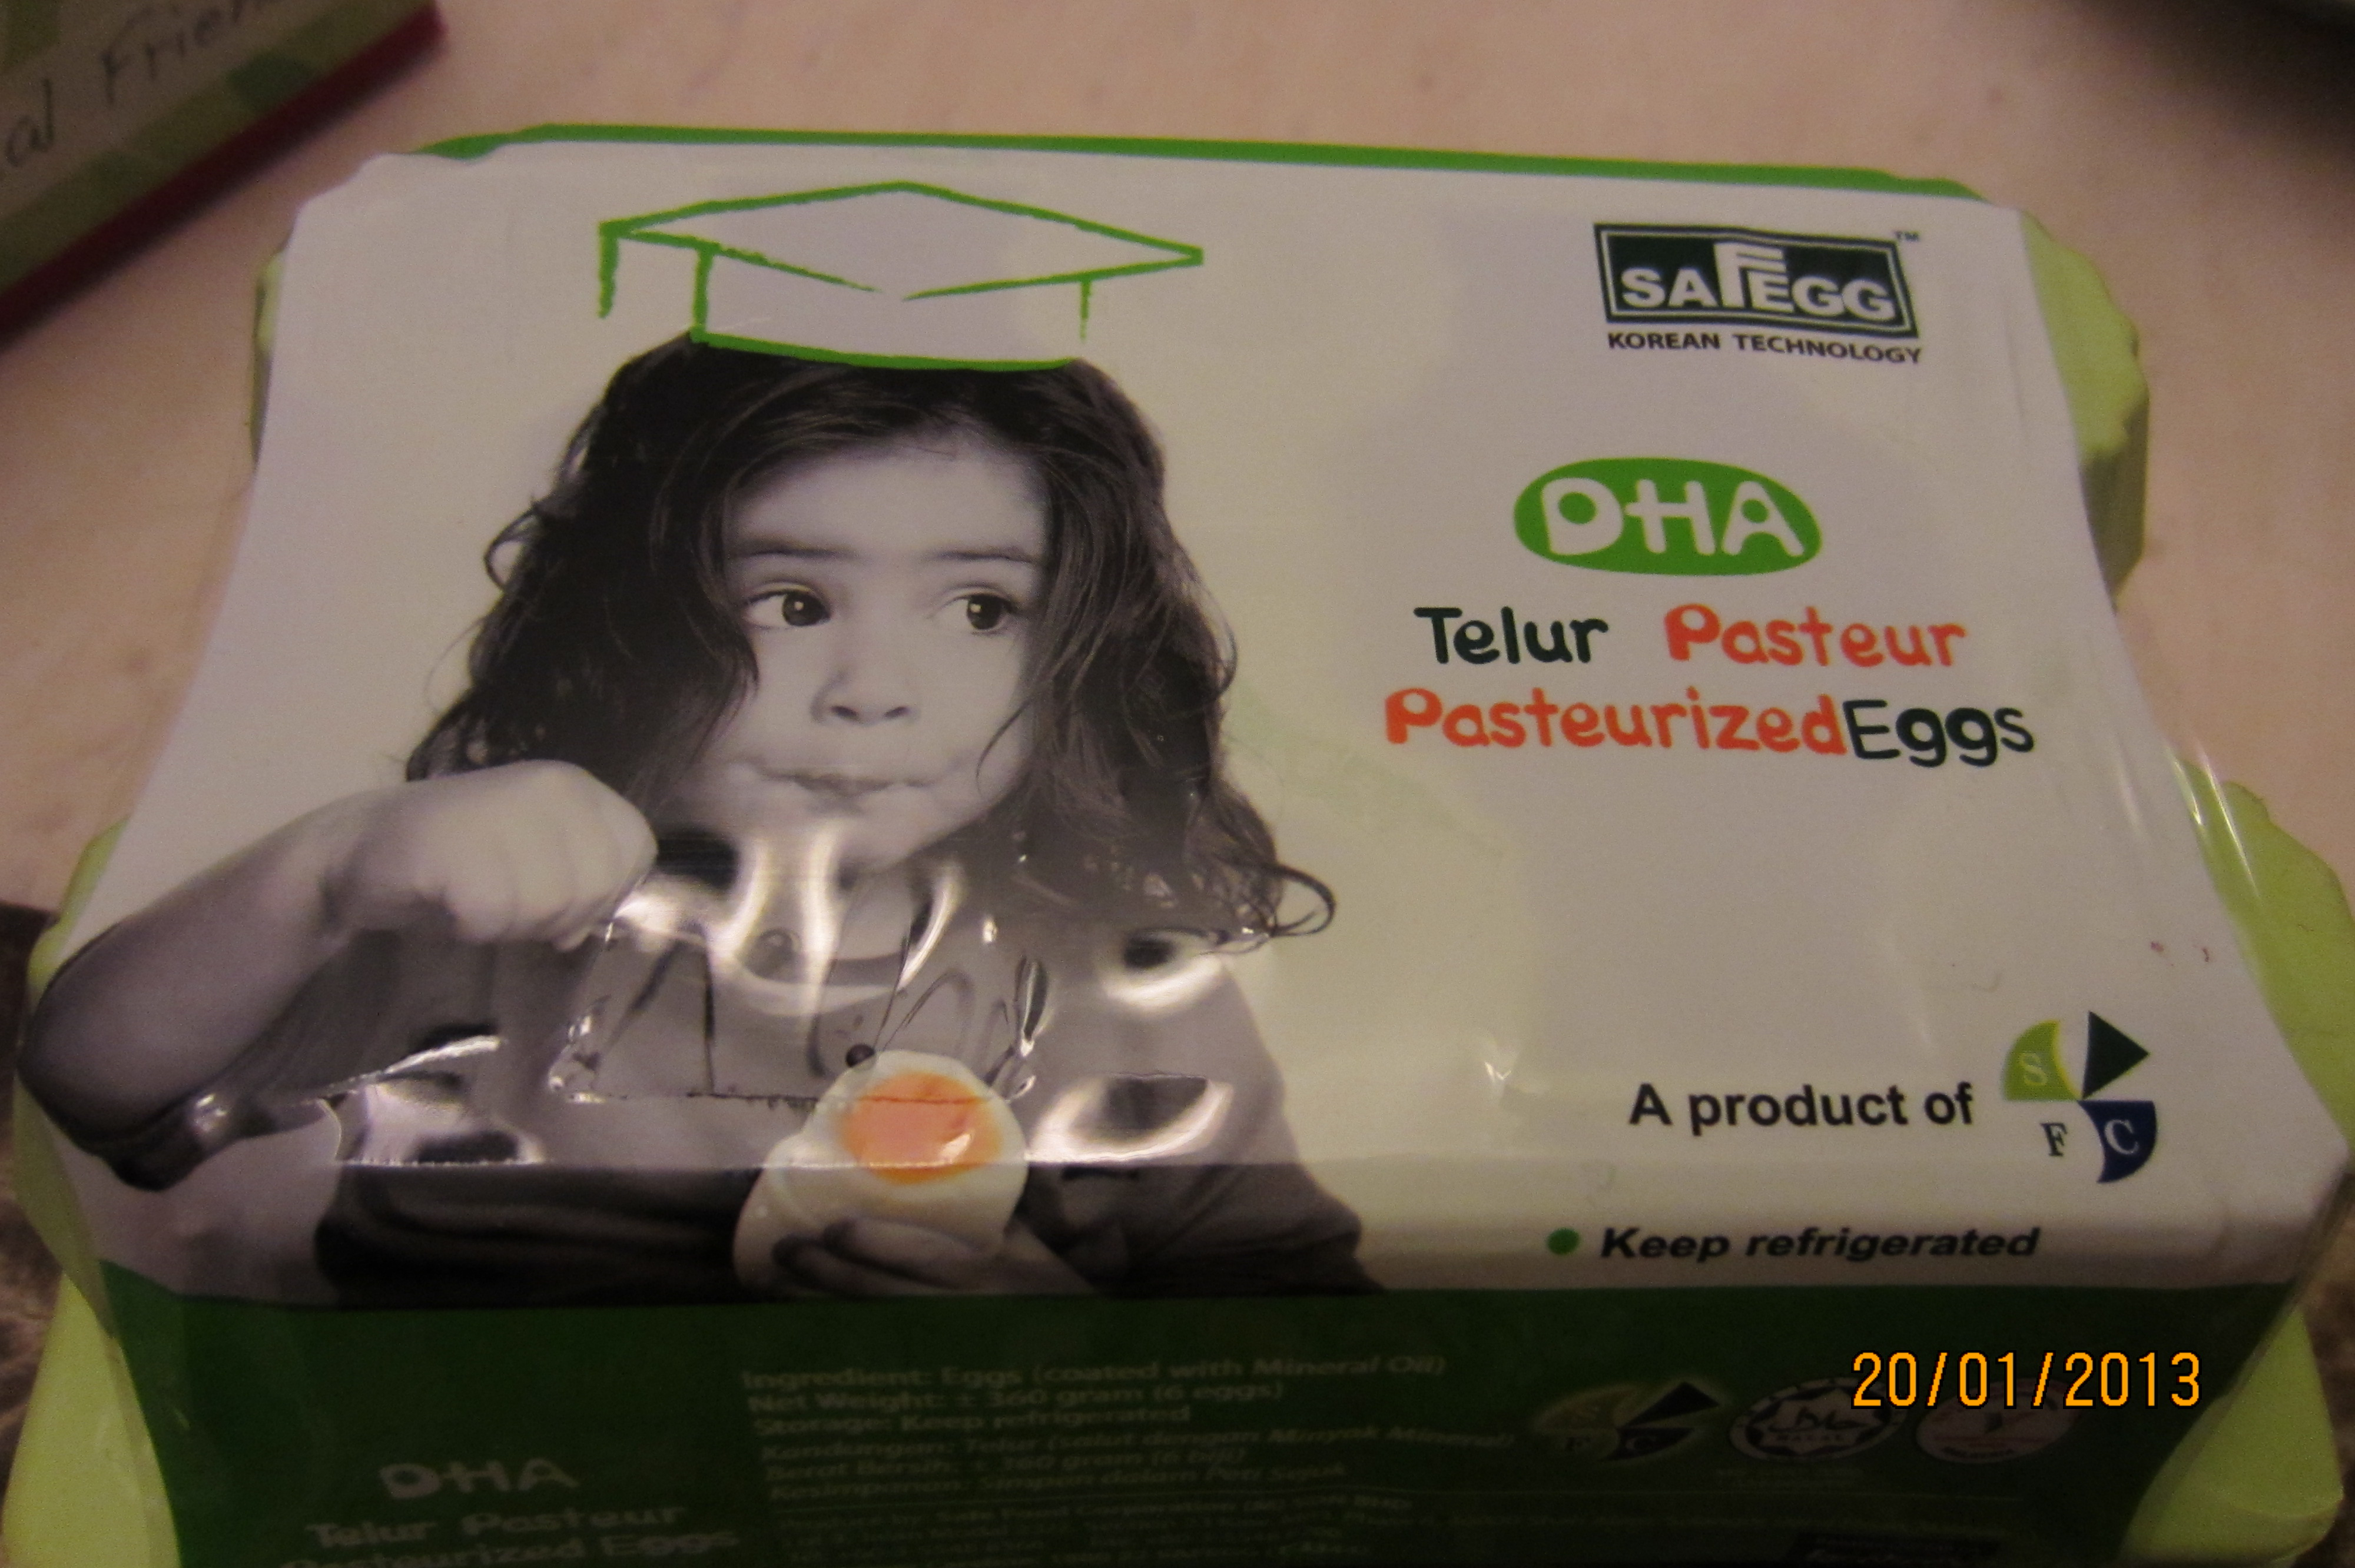 pasterurized-eggs-001.jpg